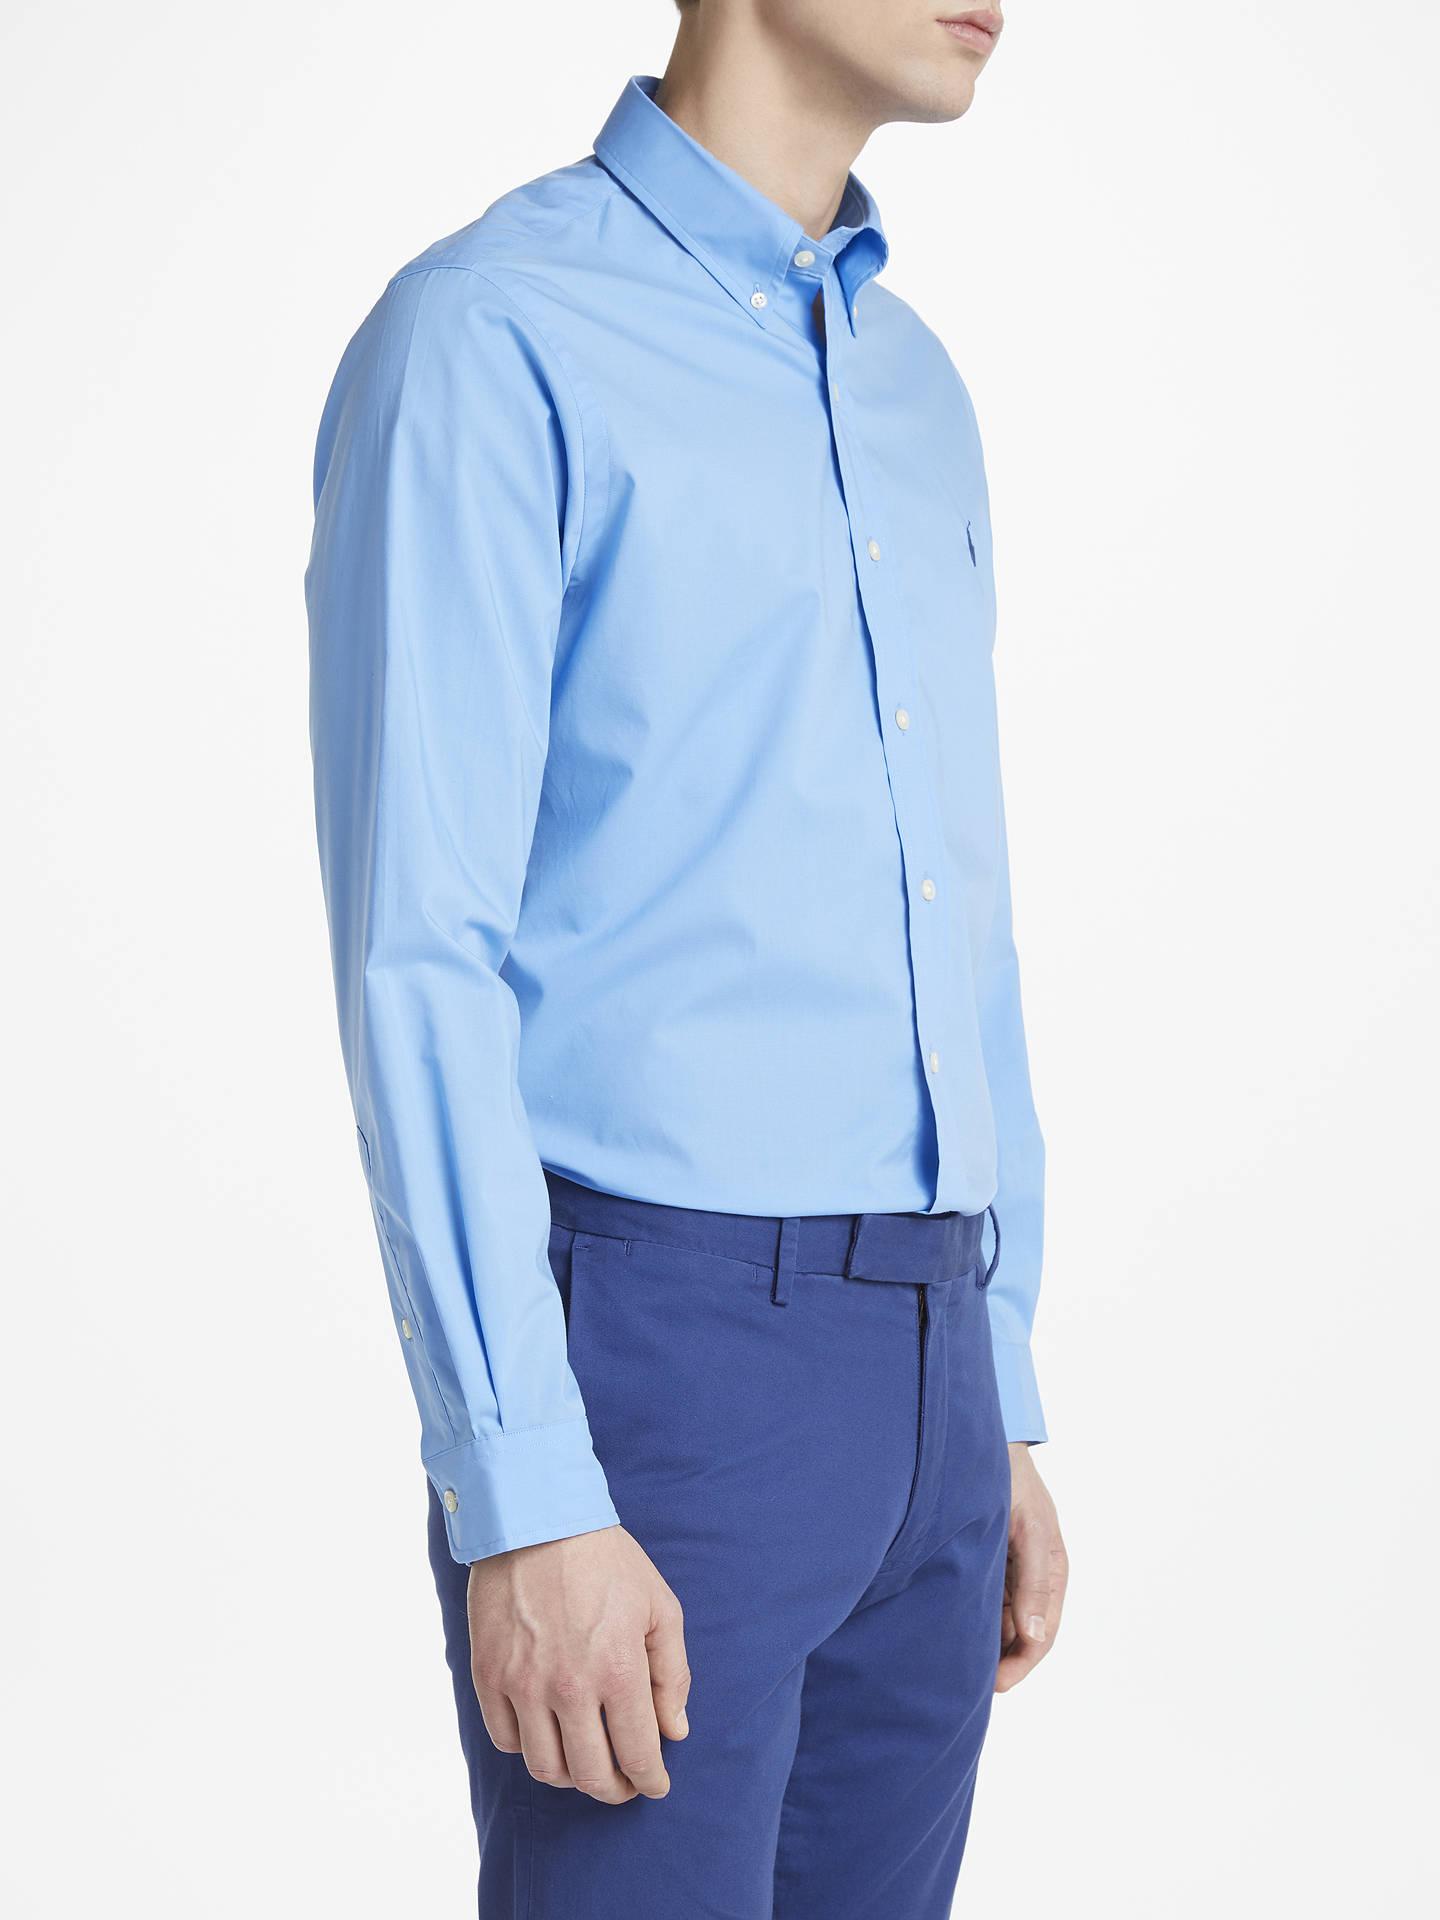 cf02e8a8b9aab Polo Ralph Lauren Slim Cotton Poplin Shirt at John Lewis   Partners